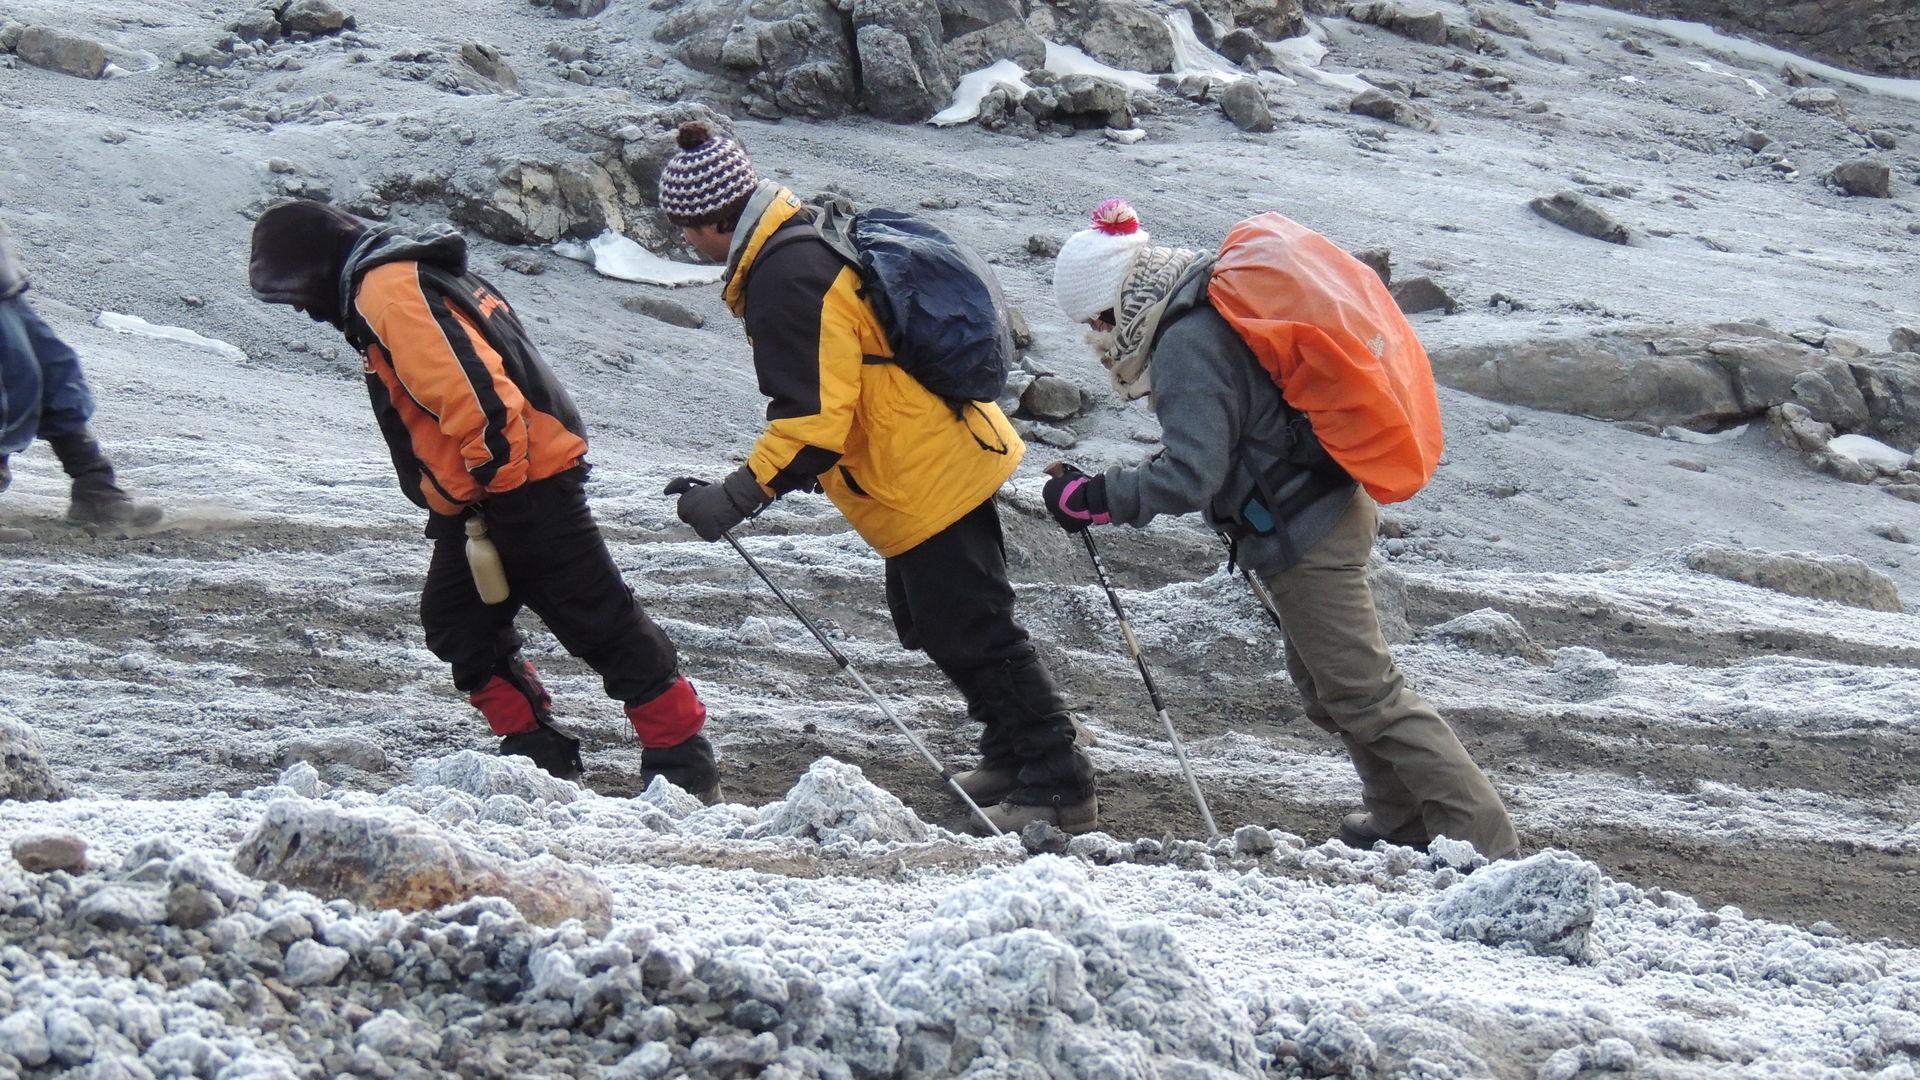 Kilimanjaro informatie - reis informatie Kilimanjaro